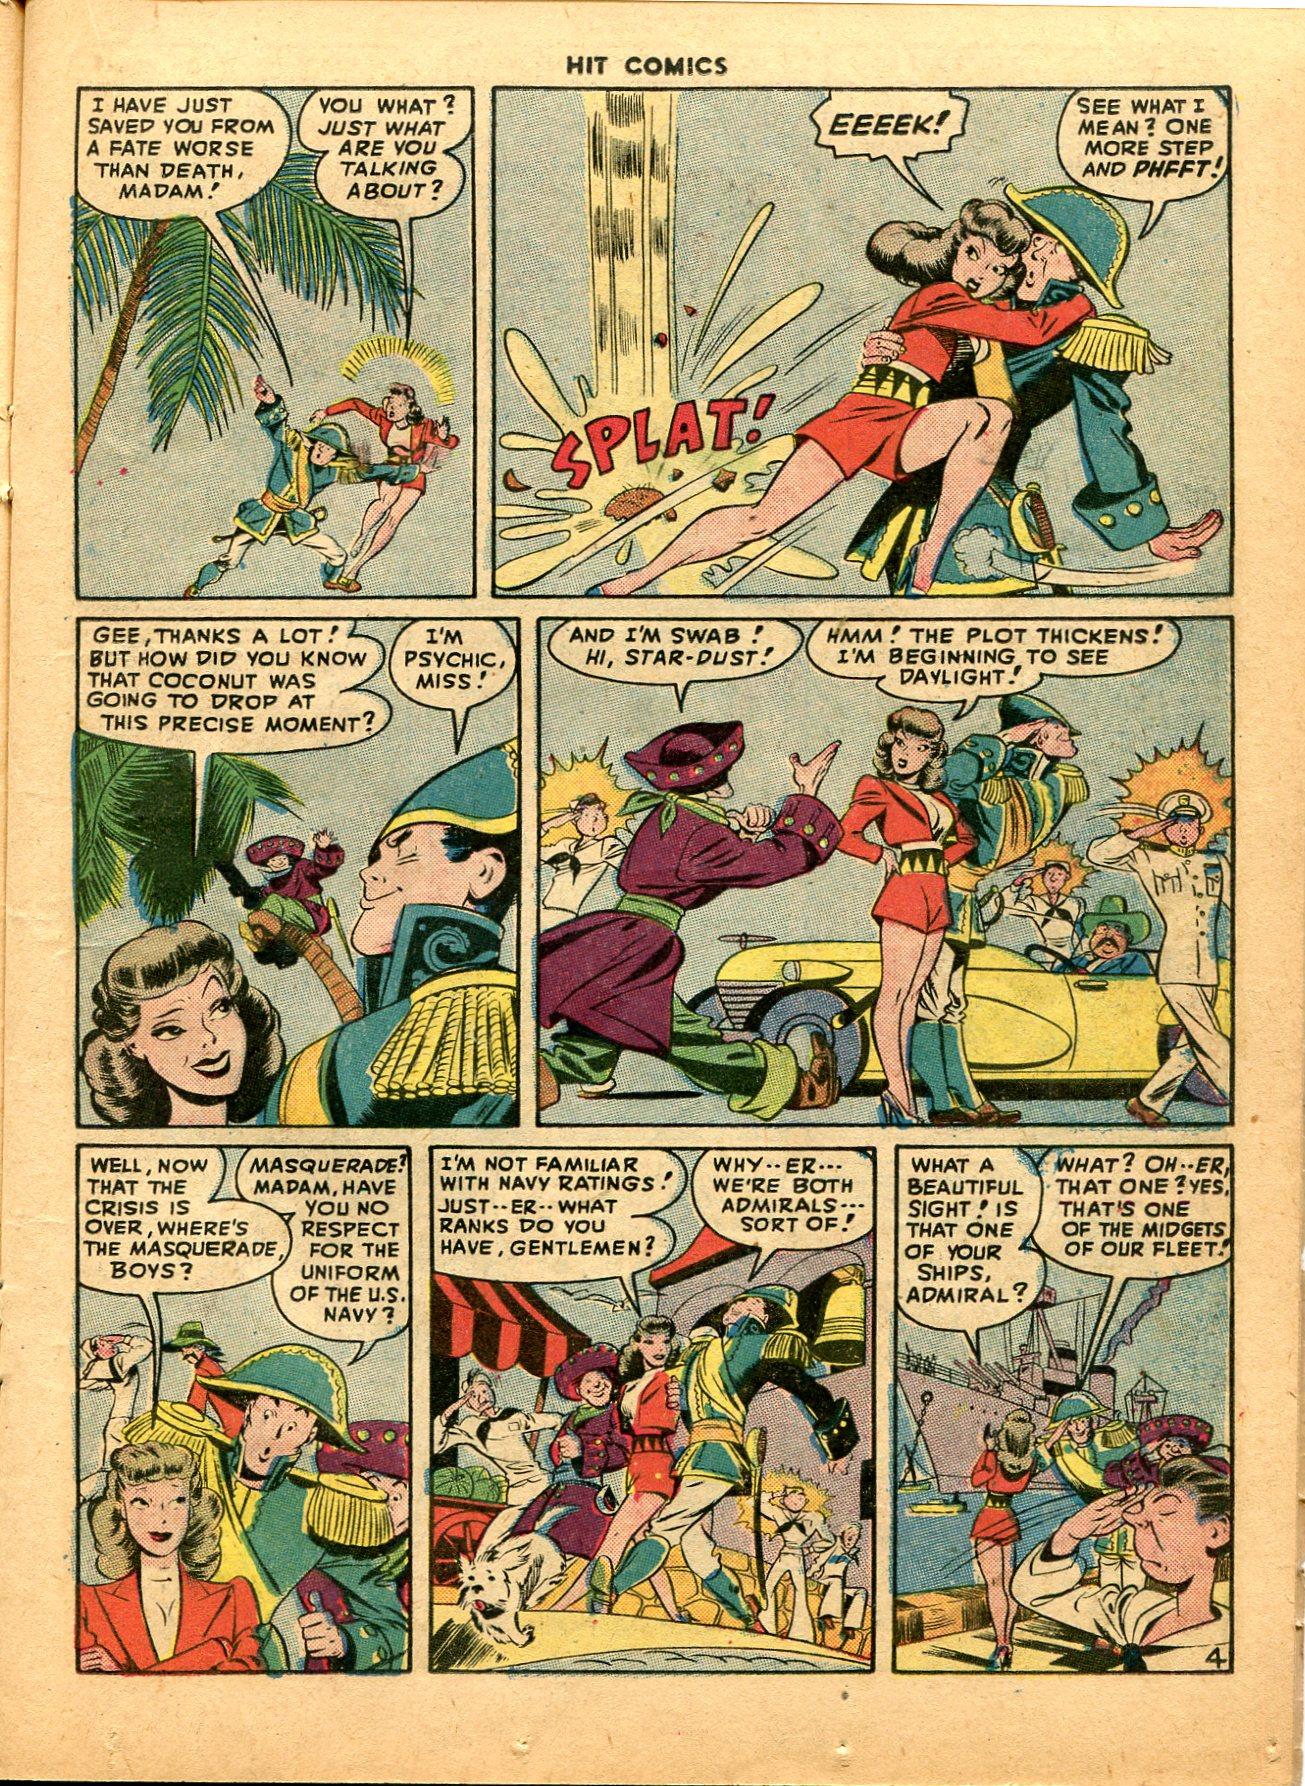 Read online Hit Comics comic -  Issue #49 - 19